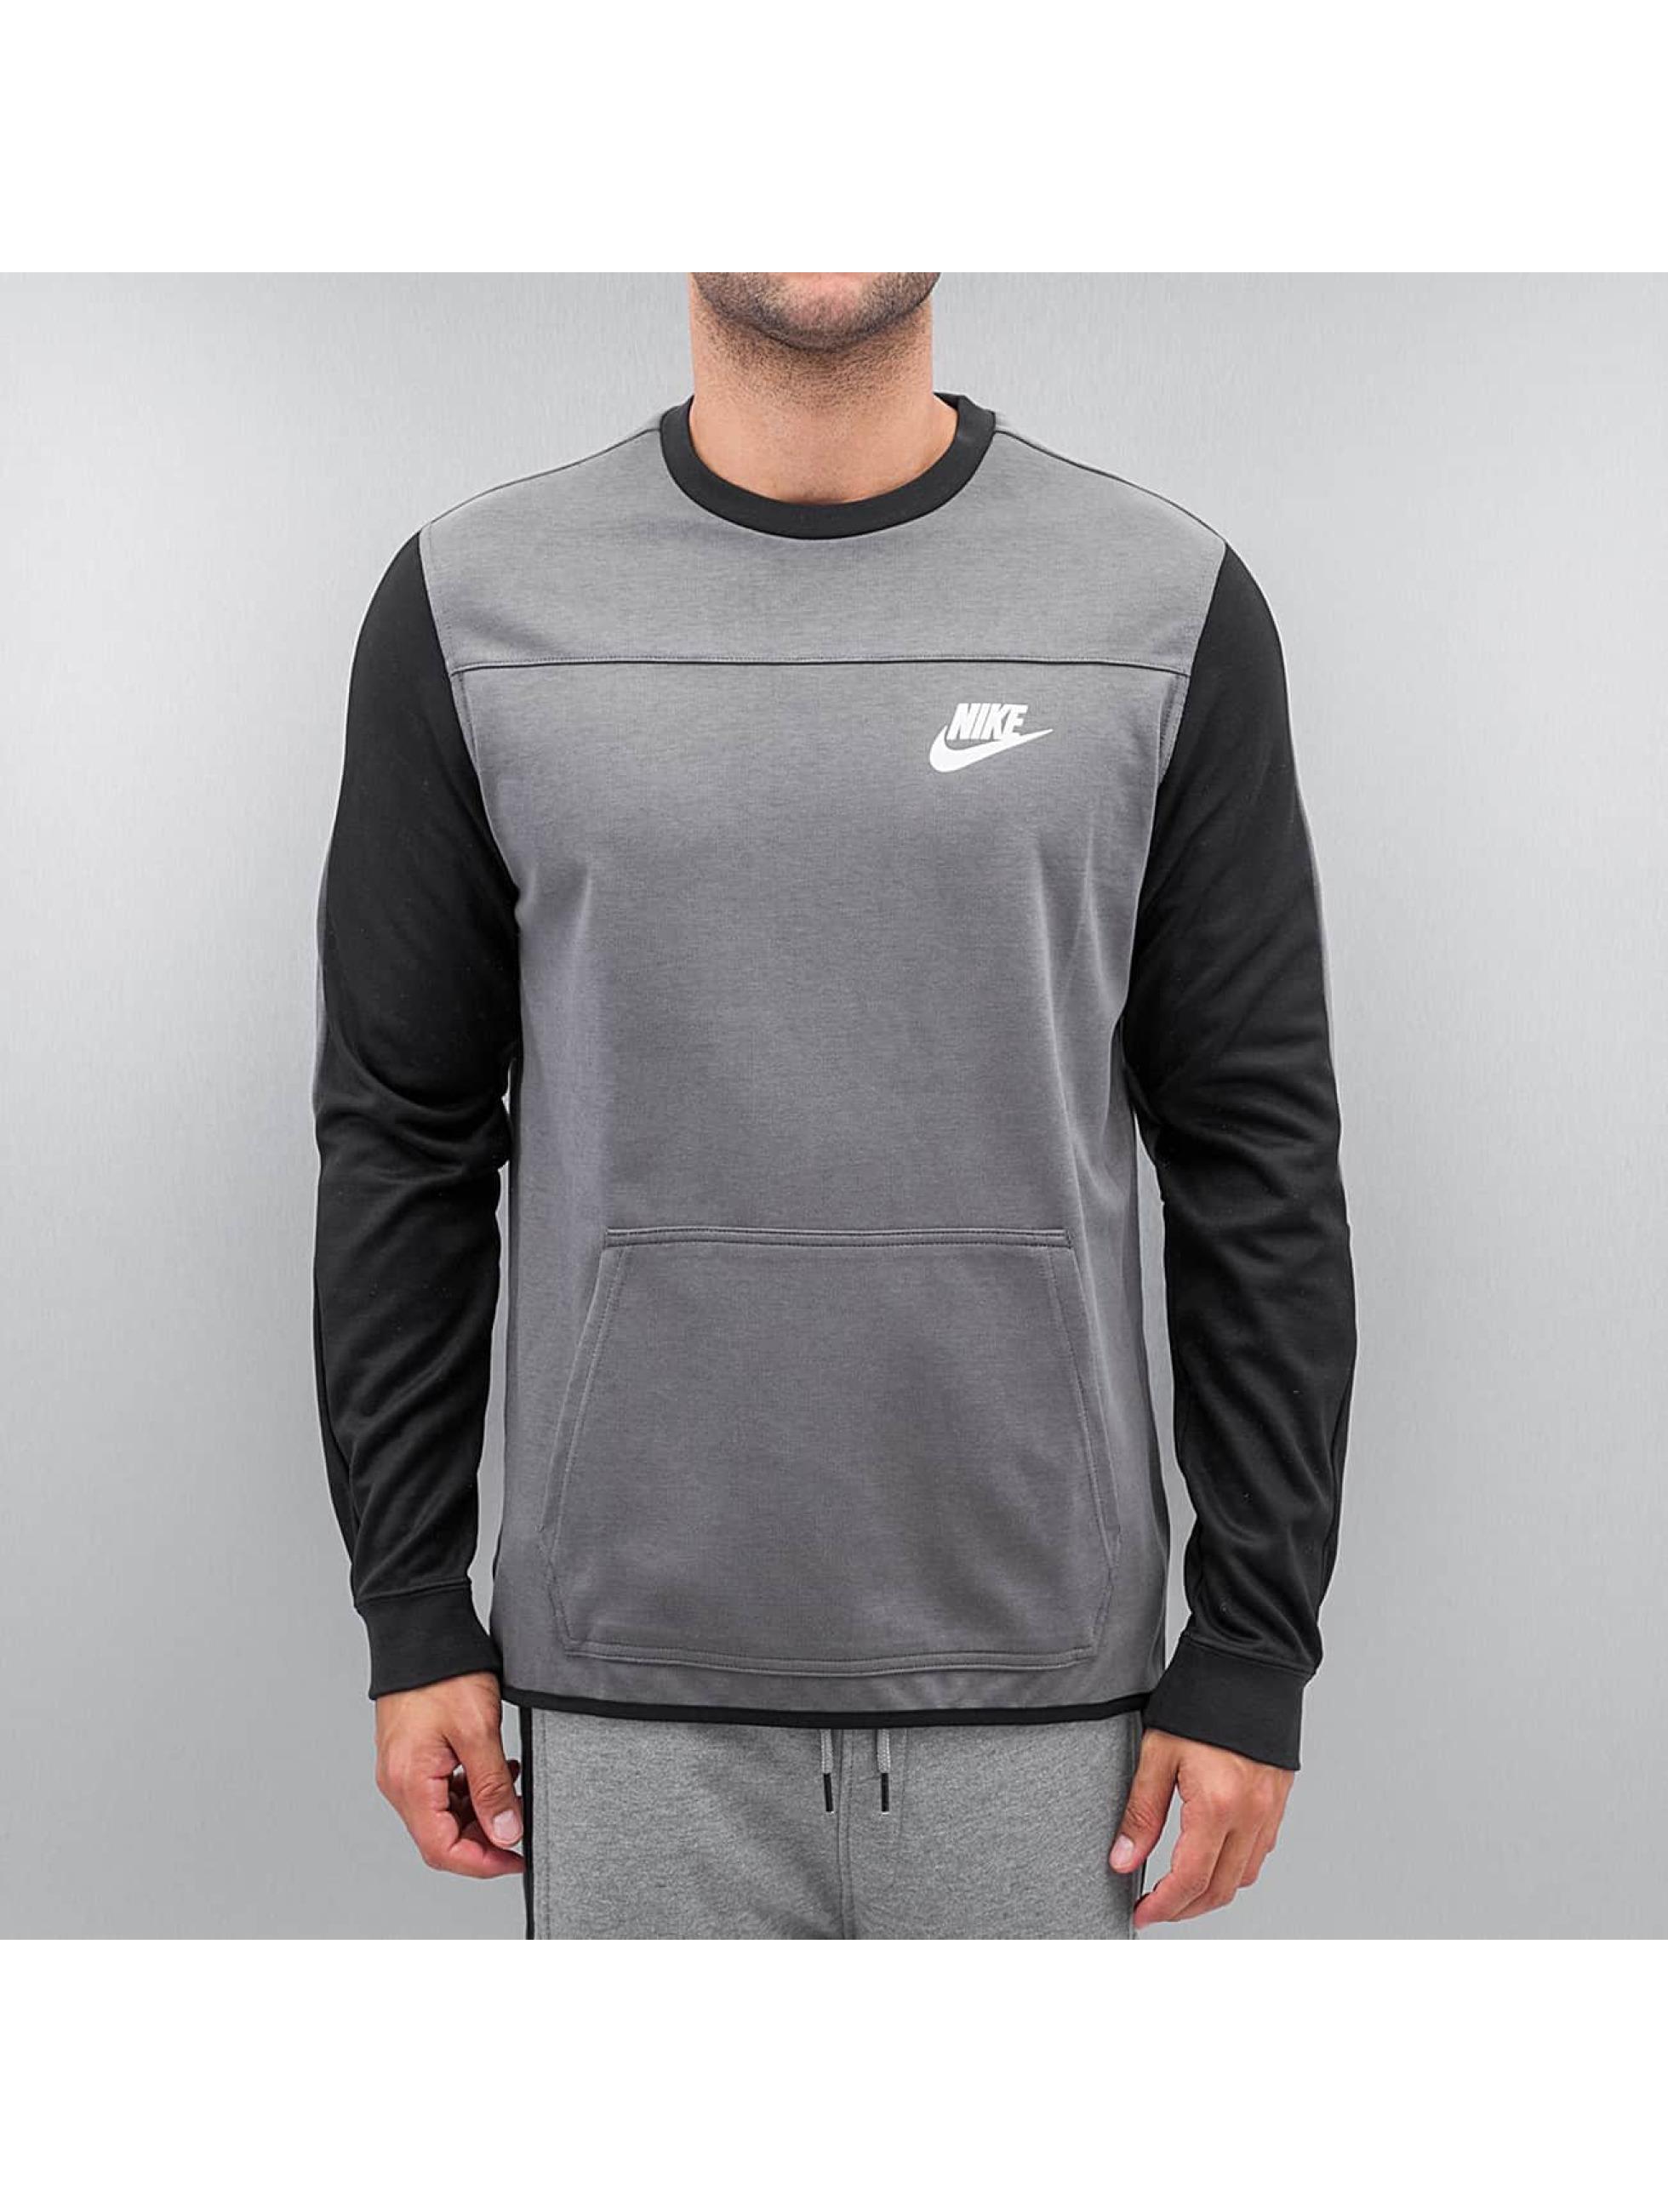 Nike Pullover Sportswear Advance 15 grau